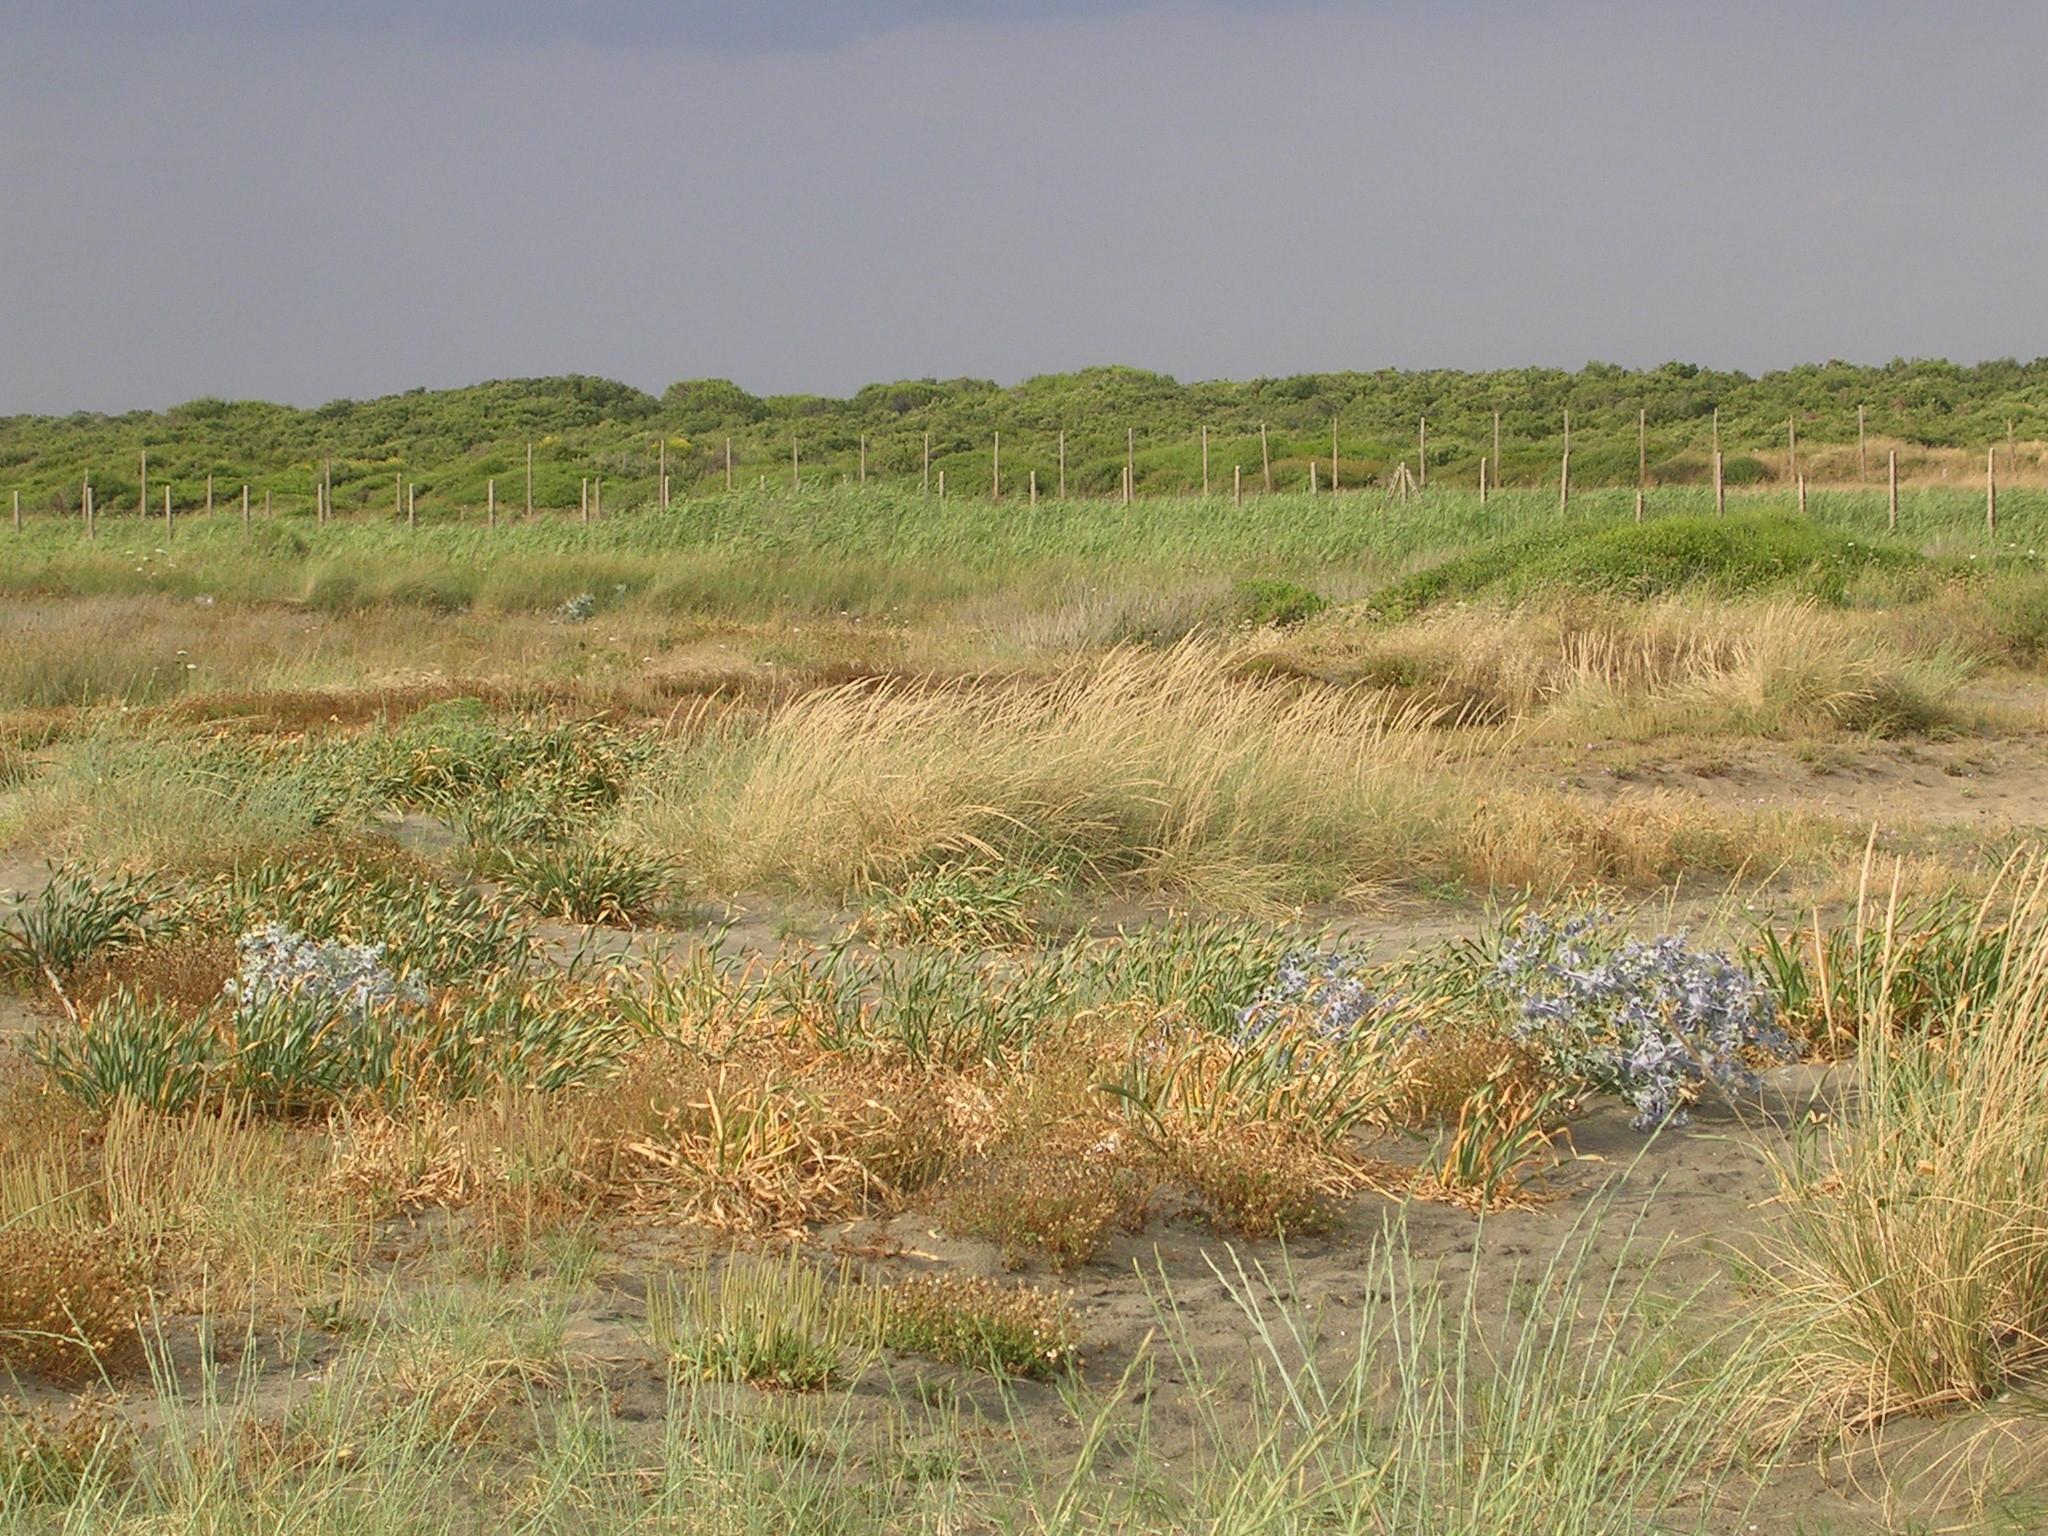 Dune costiere antistanti l'Oasi di Macchiagrande